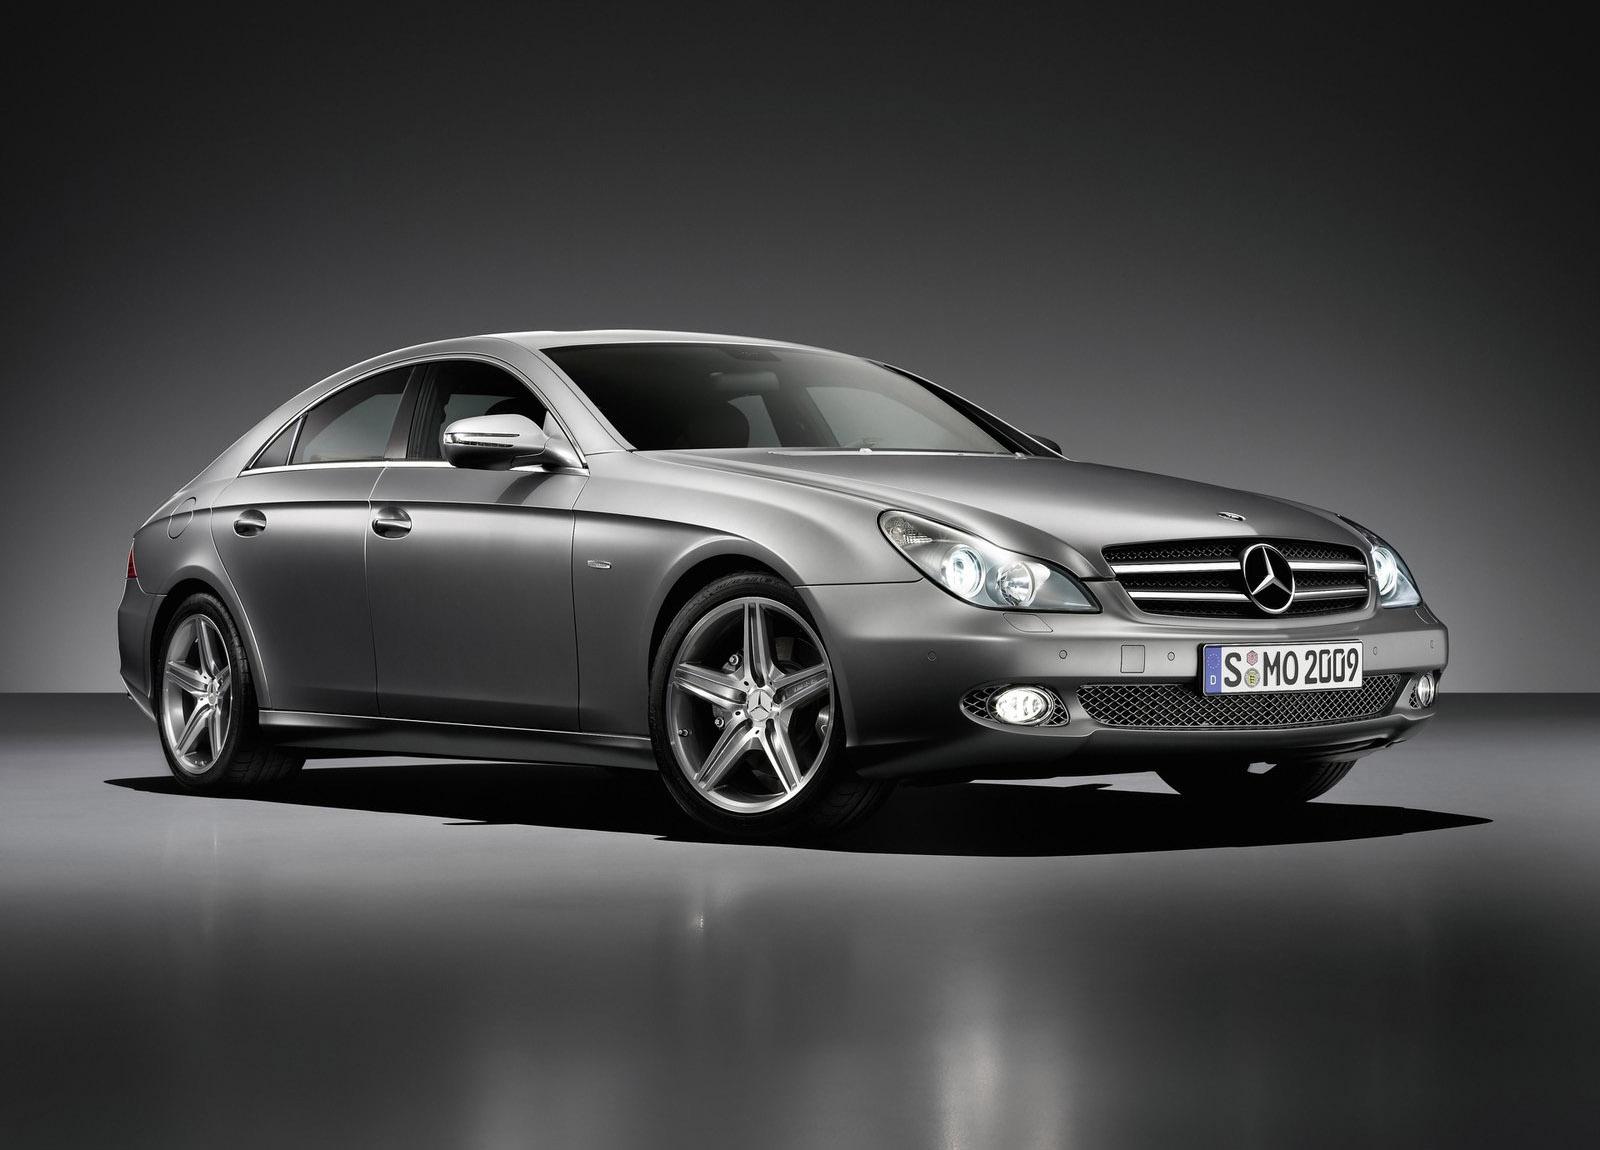 Mercedes-Benz CLS Grand Edition photo #1